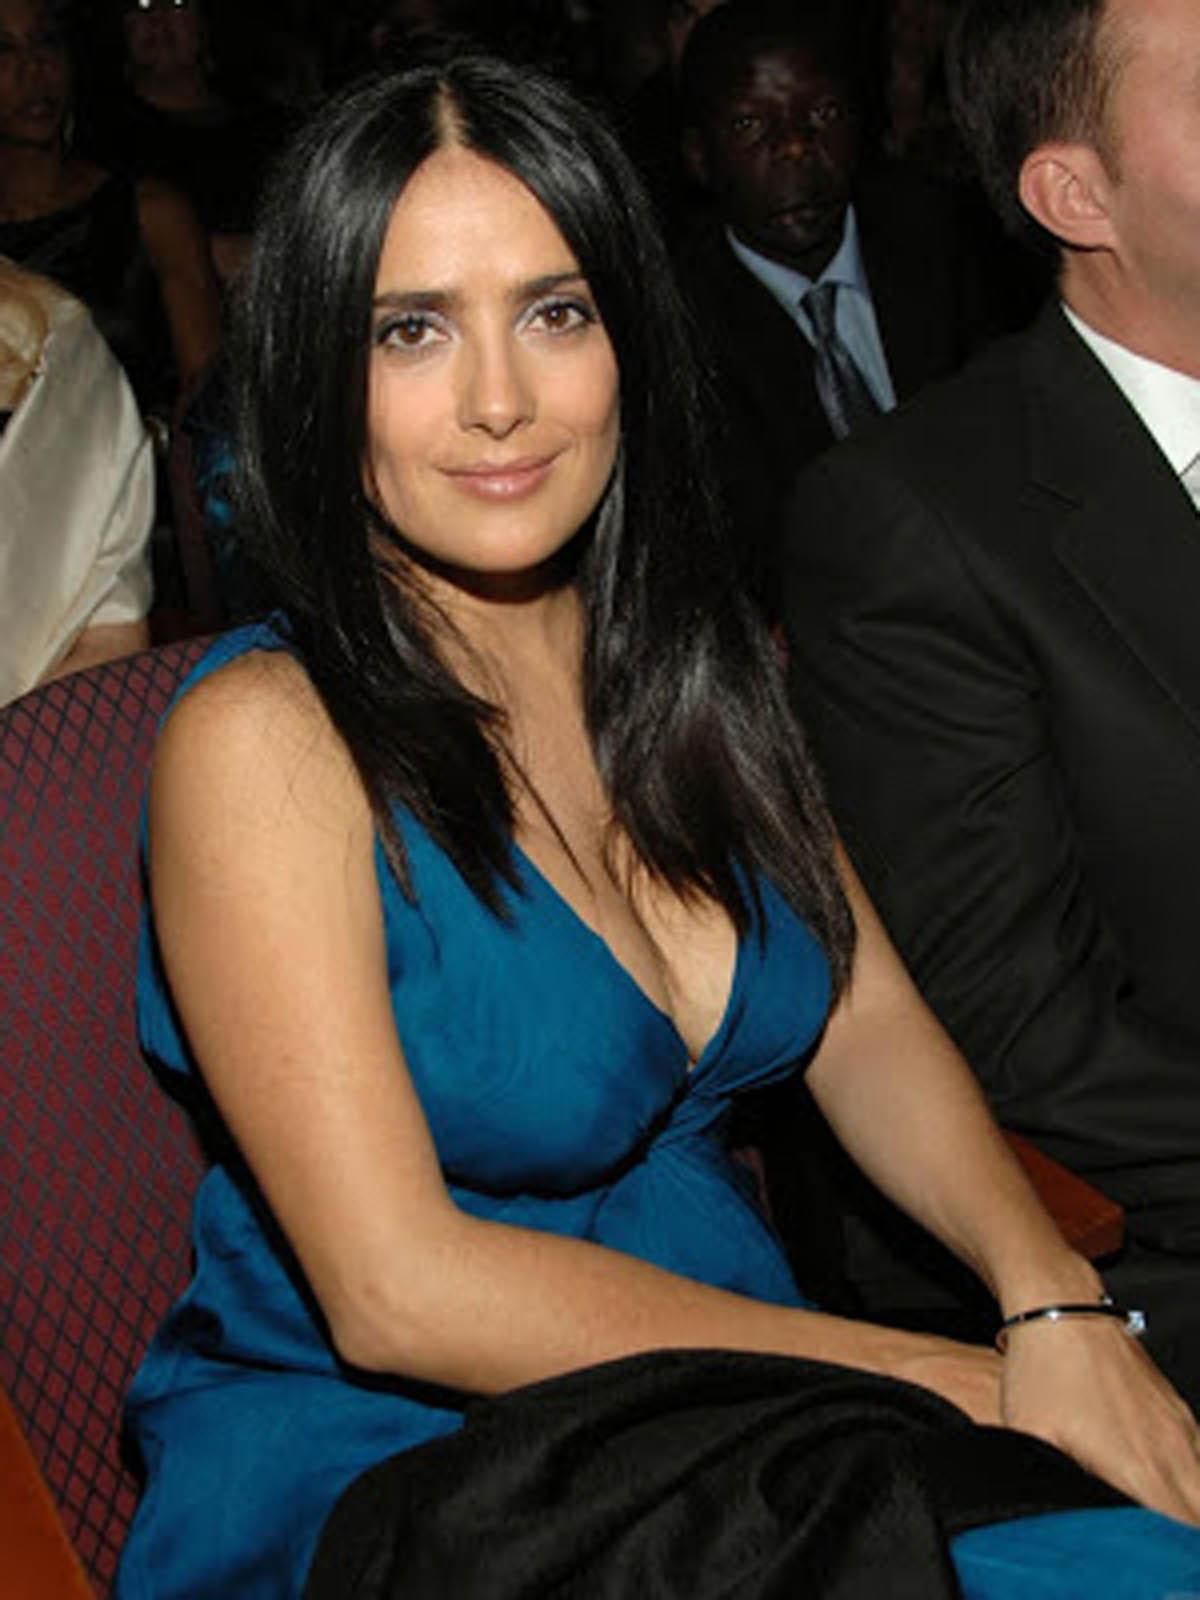 http://2.bp.blogspot.com/-ilbRoNMHQmI/UQd2ekuwpJI/AAAAAAAAE48/5qrUz0yICd8/s1600/Salma+Hayek+super+Pictures+%283%29.jpg